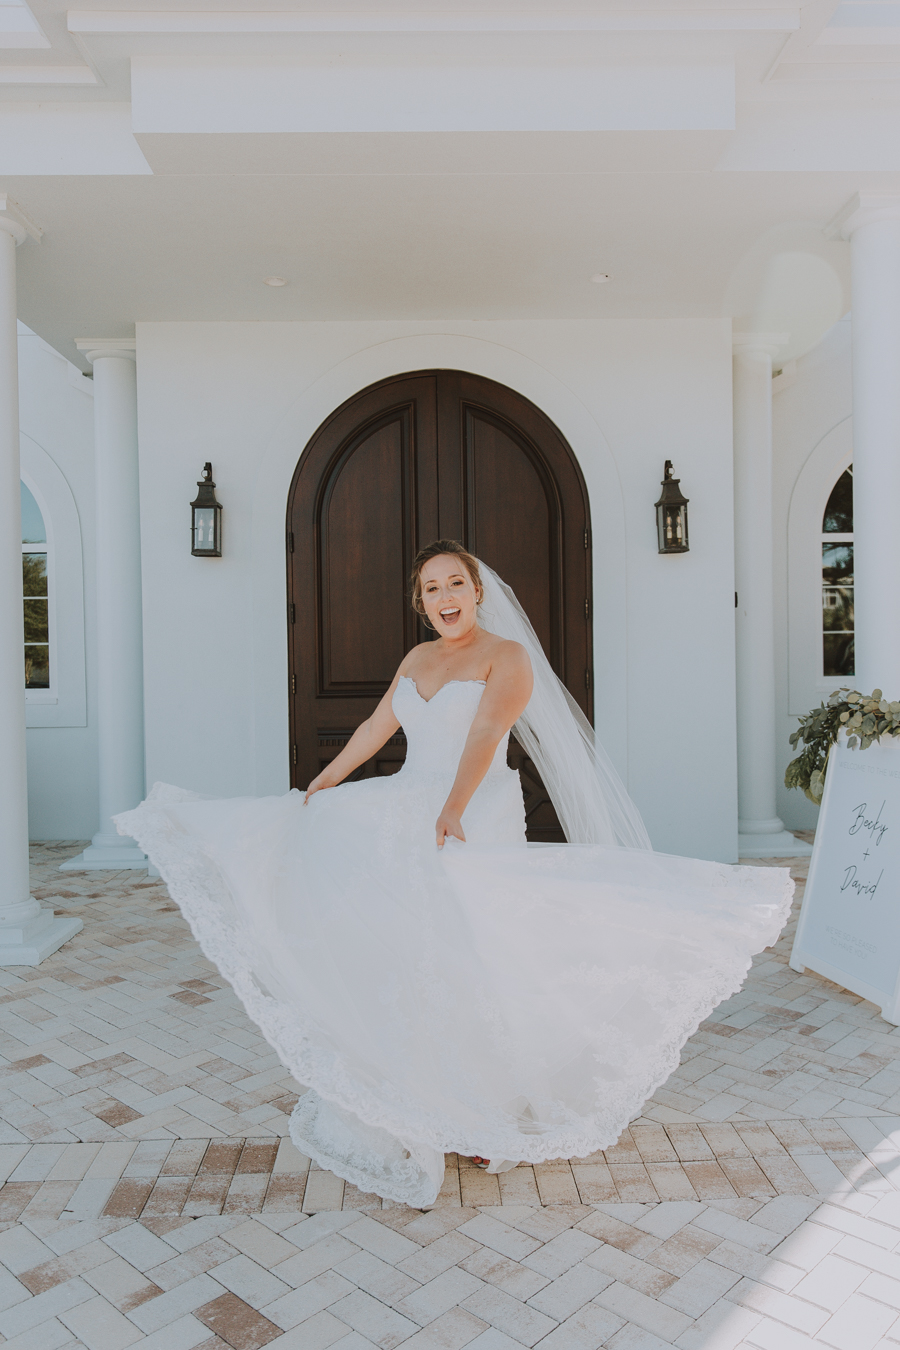 Harborside Chapel Wedding Clearwater Affordable Tampa Venues BHLDN Palm Harbor Safety Harbor Resort and Spa Wedding Malindy Elene Bridal St Pete Wedding Photographer Tampa Wedding Photographer-80.jpg